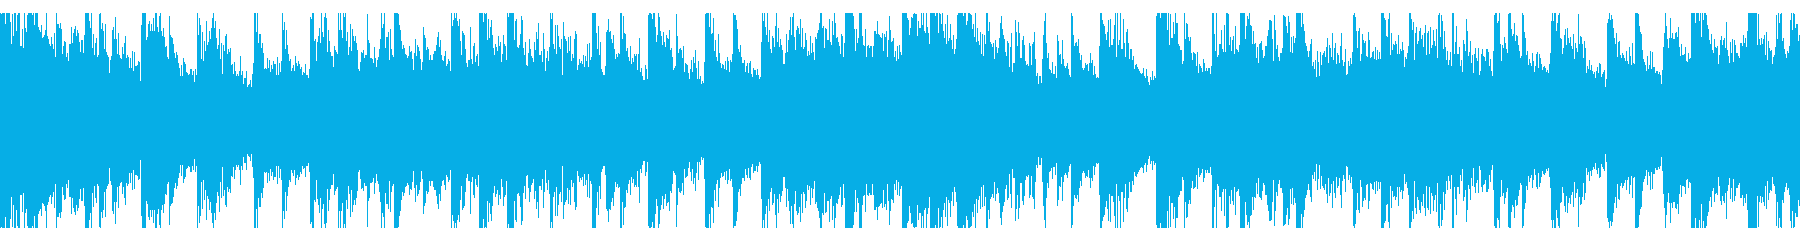 NeonDreamの再生済みの波形